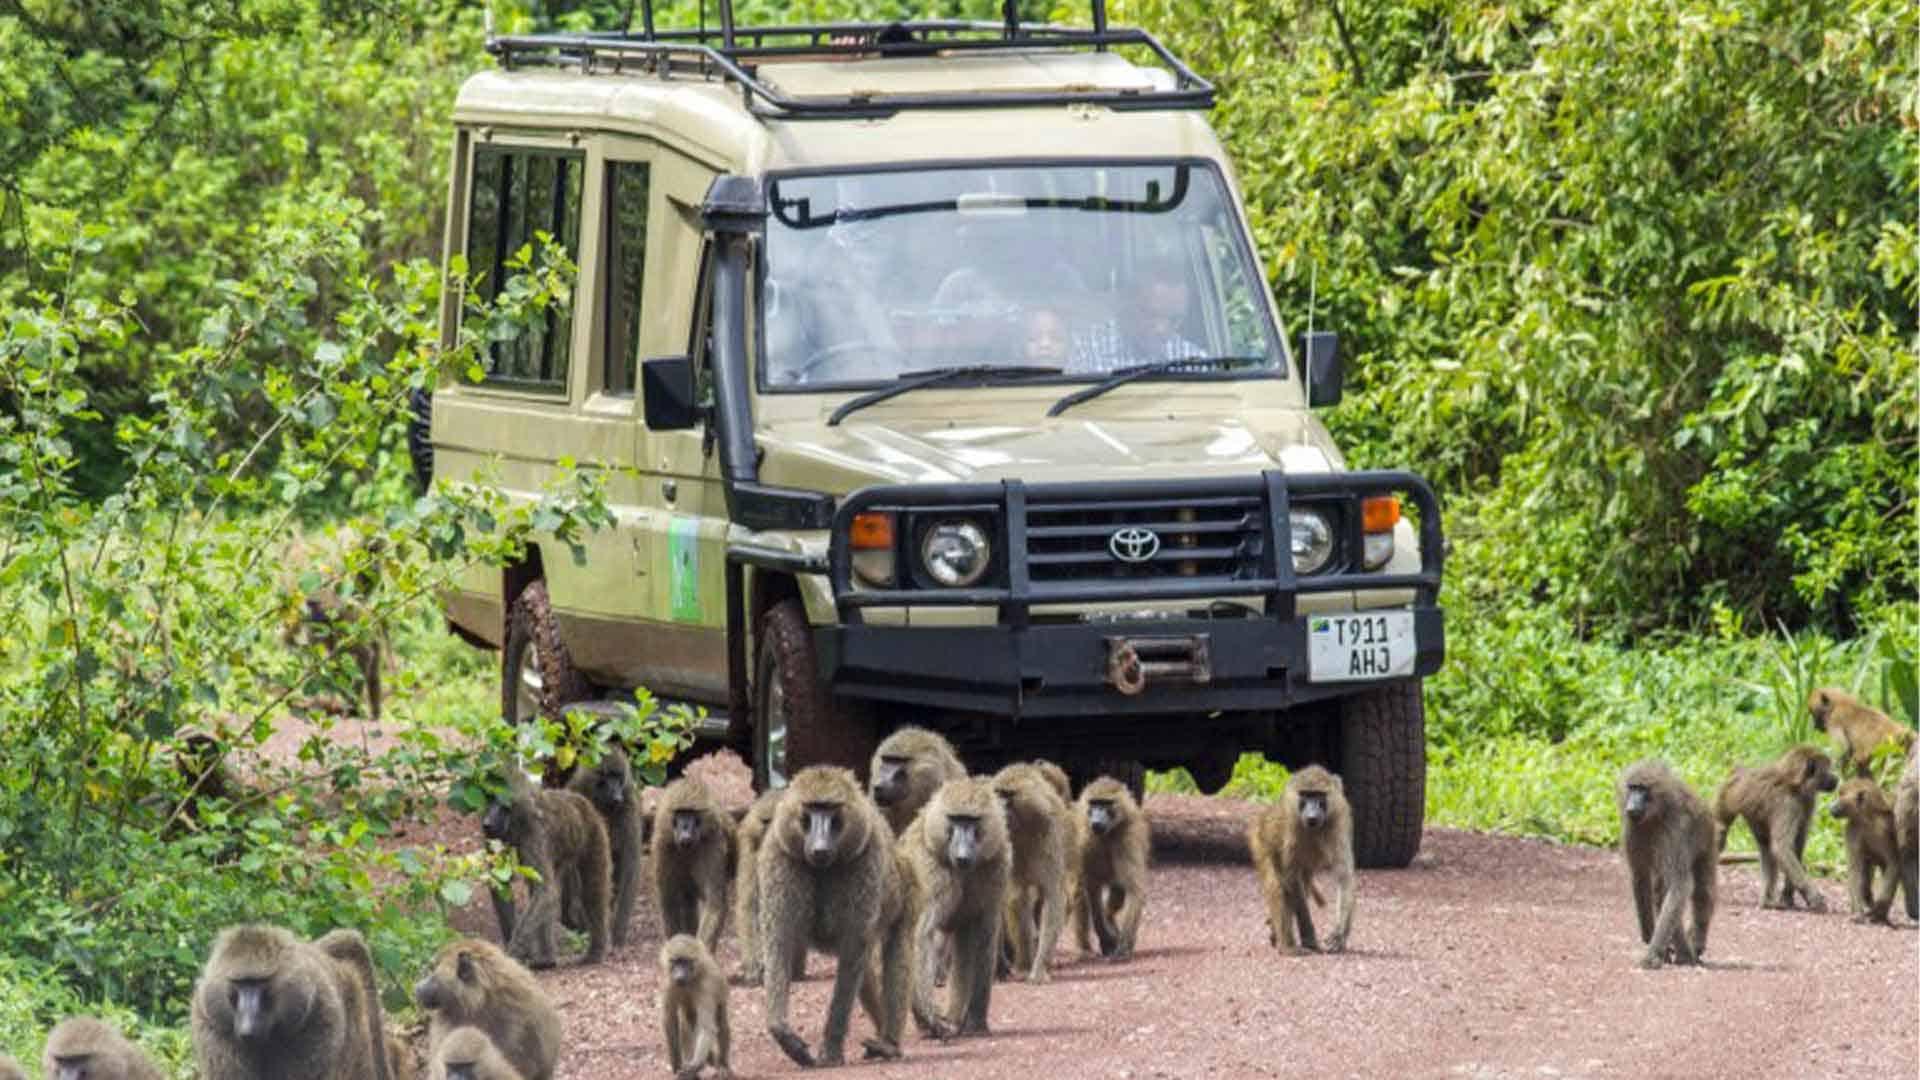 Safari vehicle following a troup of monkeys along a road on safari tours to Tanzania